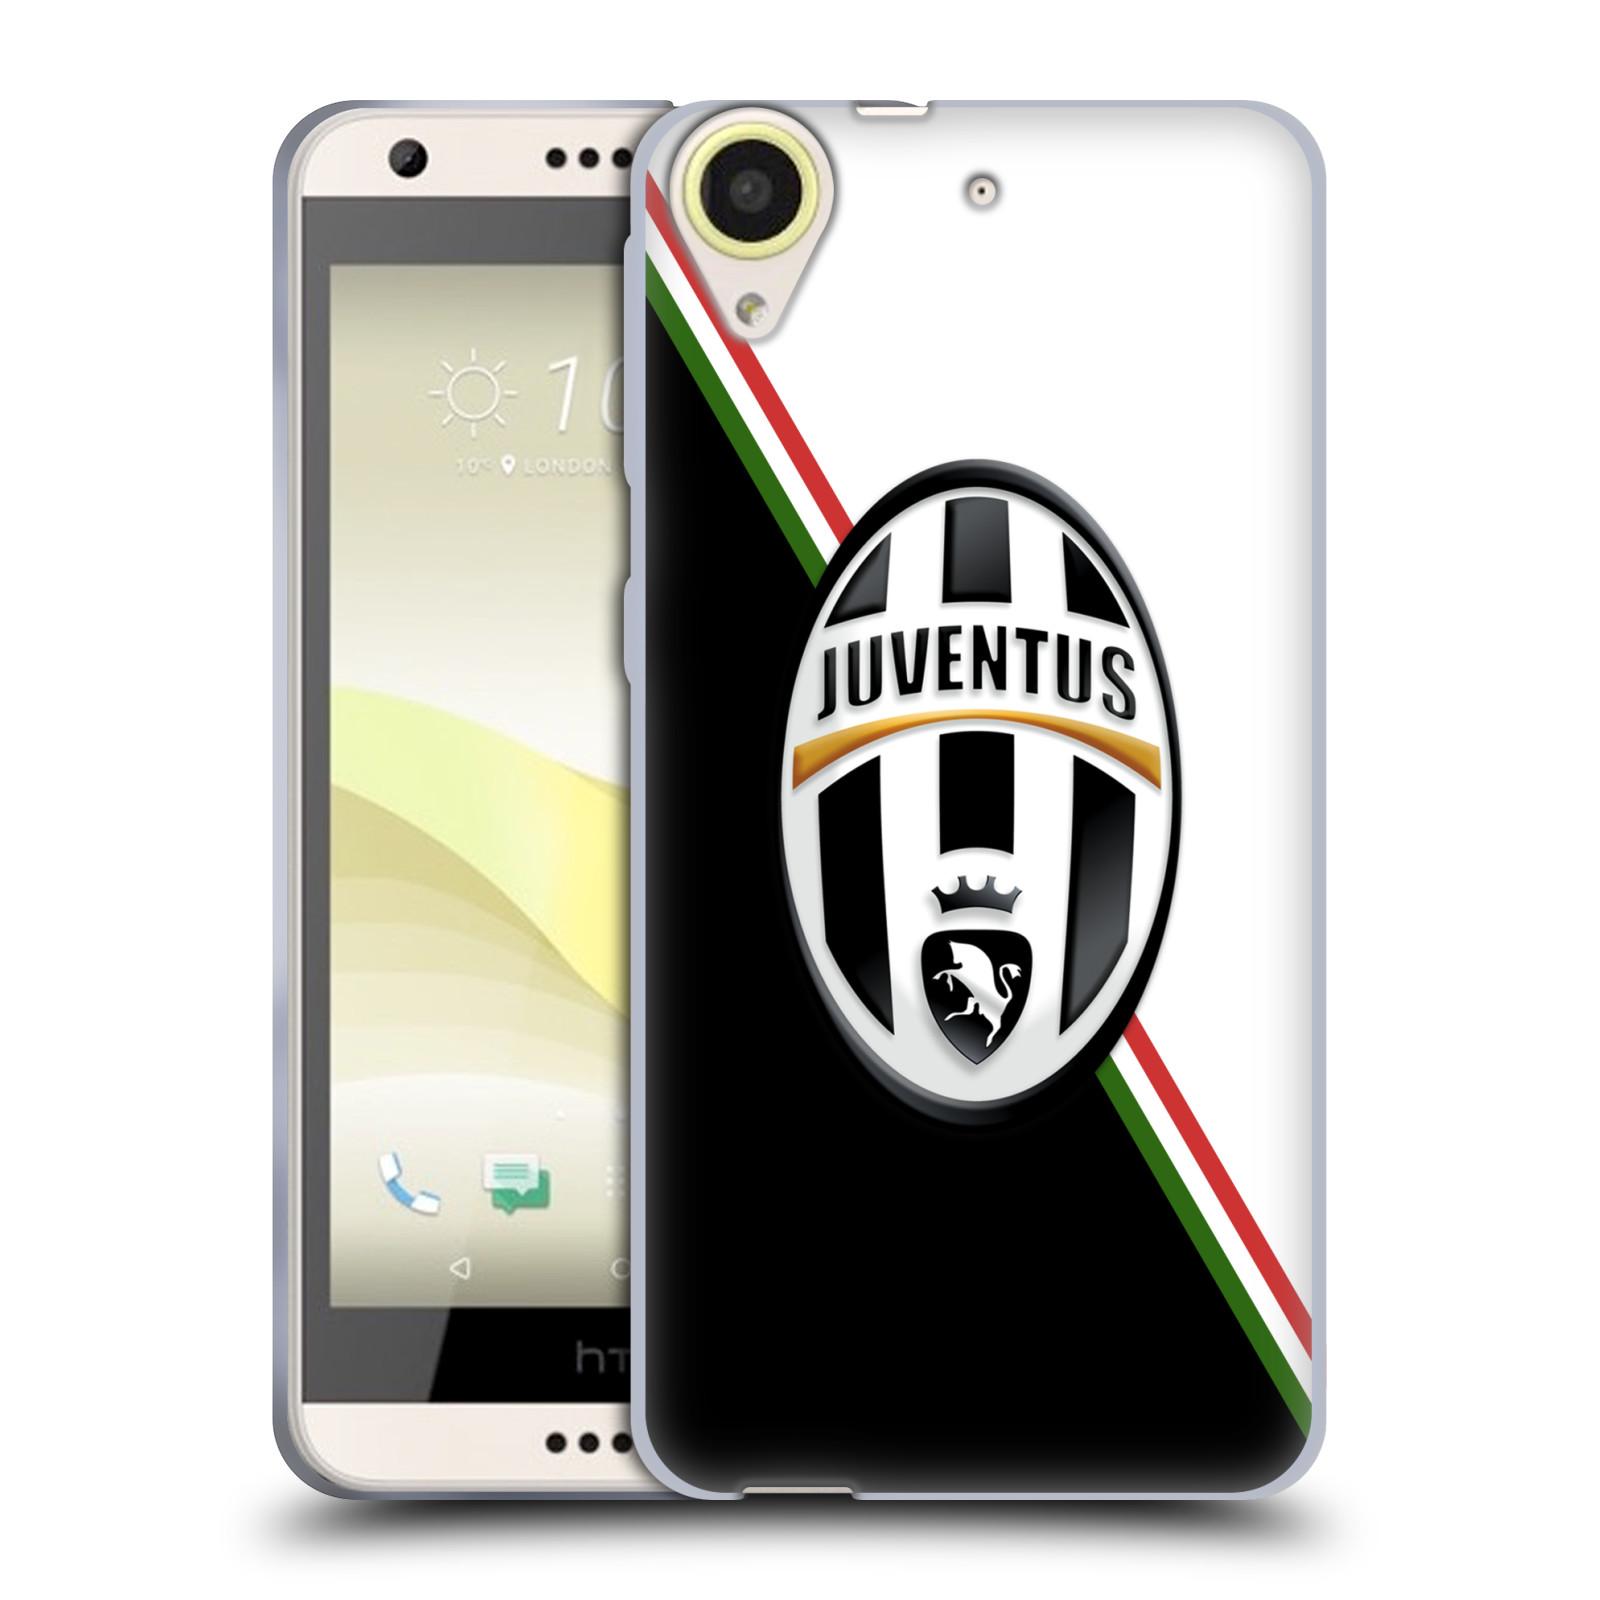 Silikonové pouzdro na mobil HTC Desire 650 HEAD CASE Juventus FC - Black and White (Silikonový kryt či obal na mobilní telefon Juventus FC Official pro HTC Desire 650)